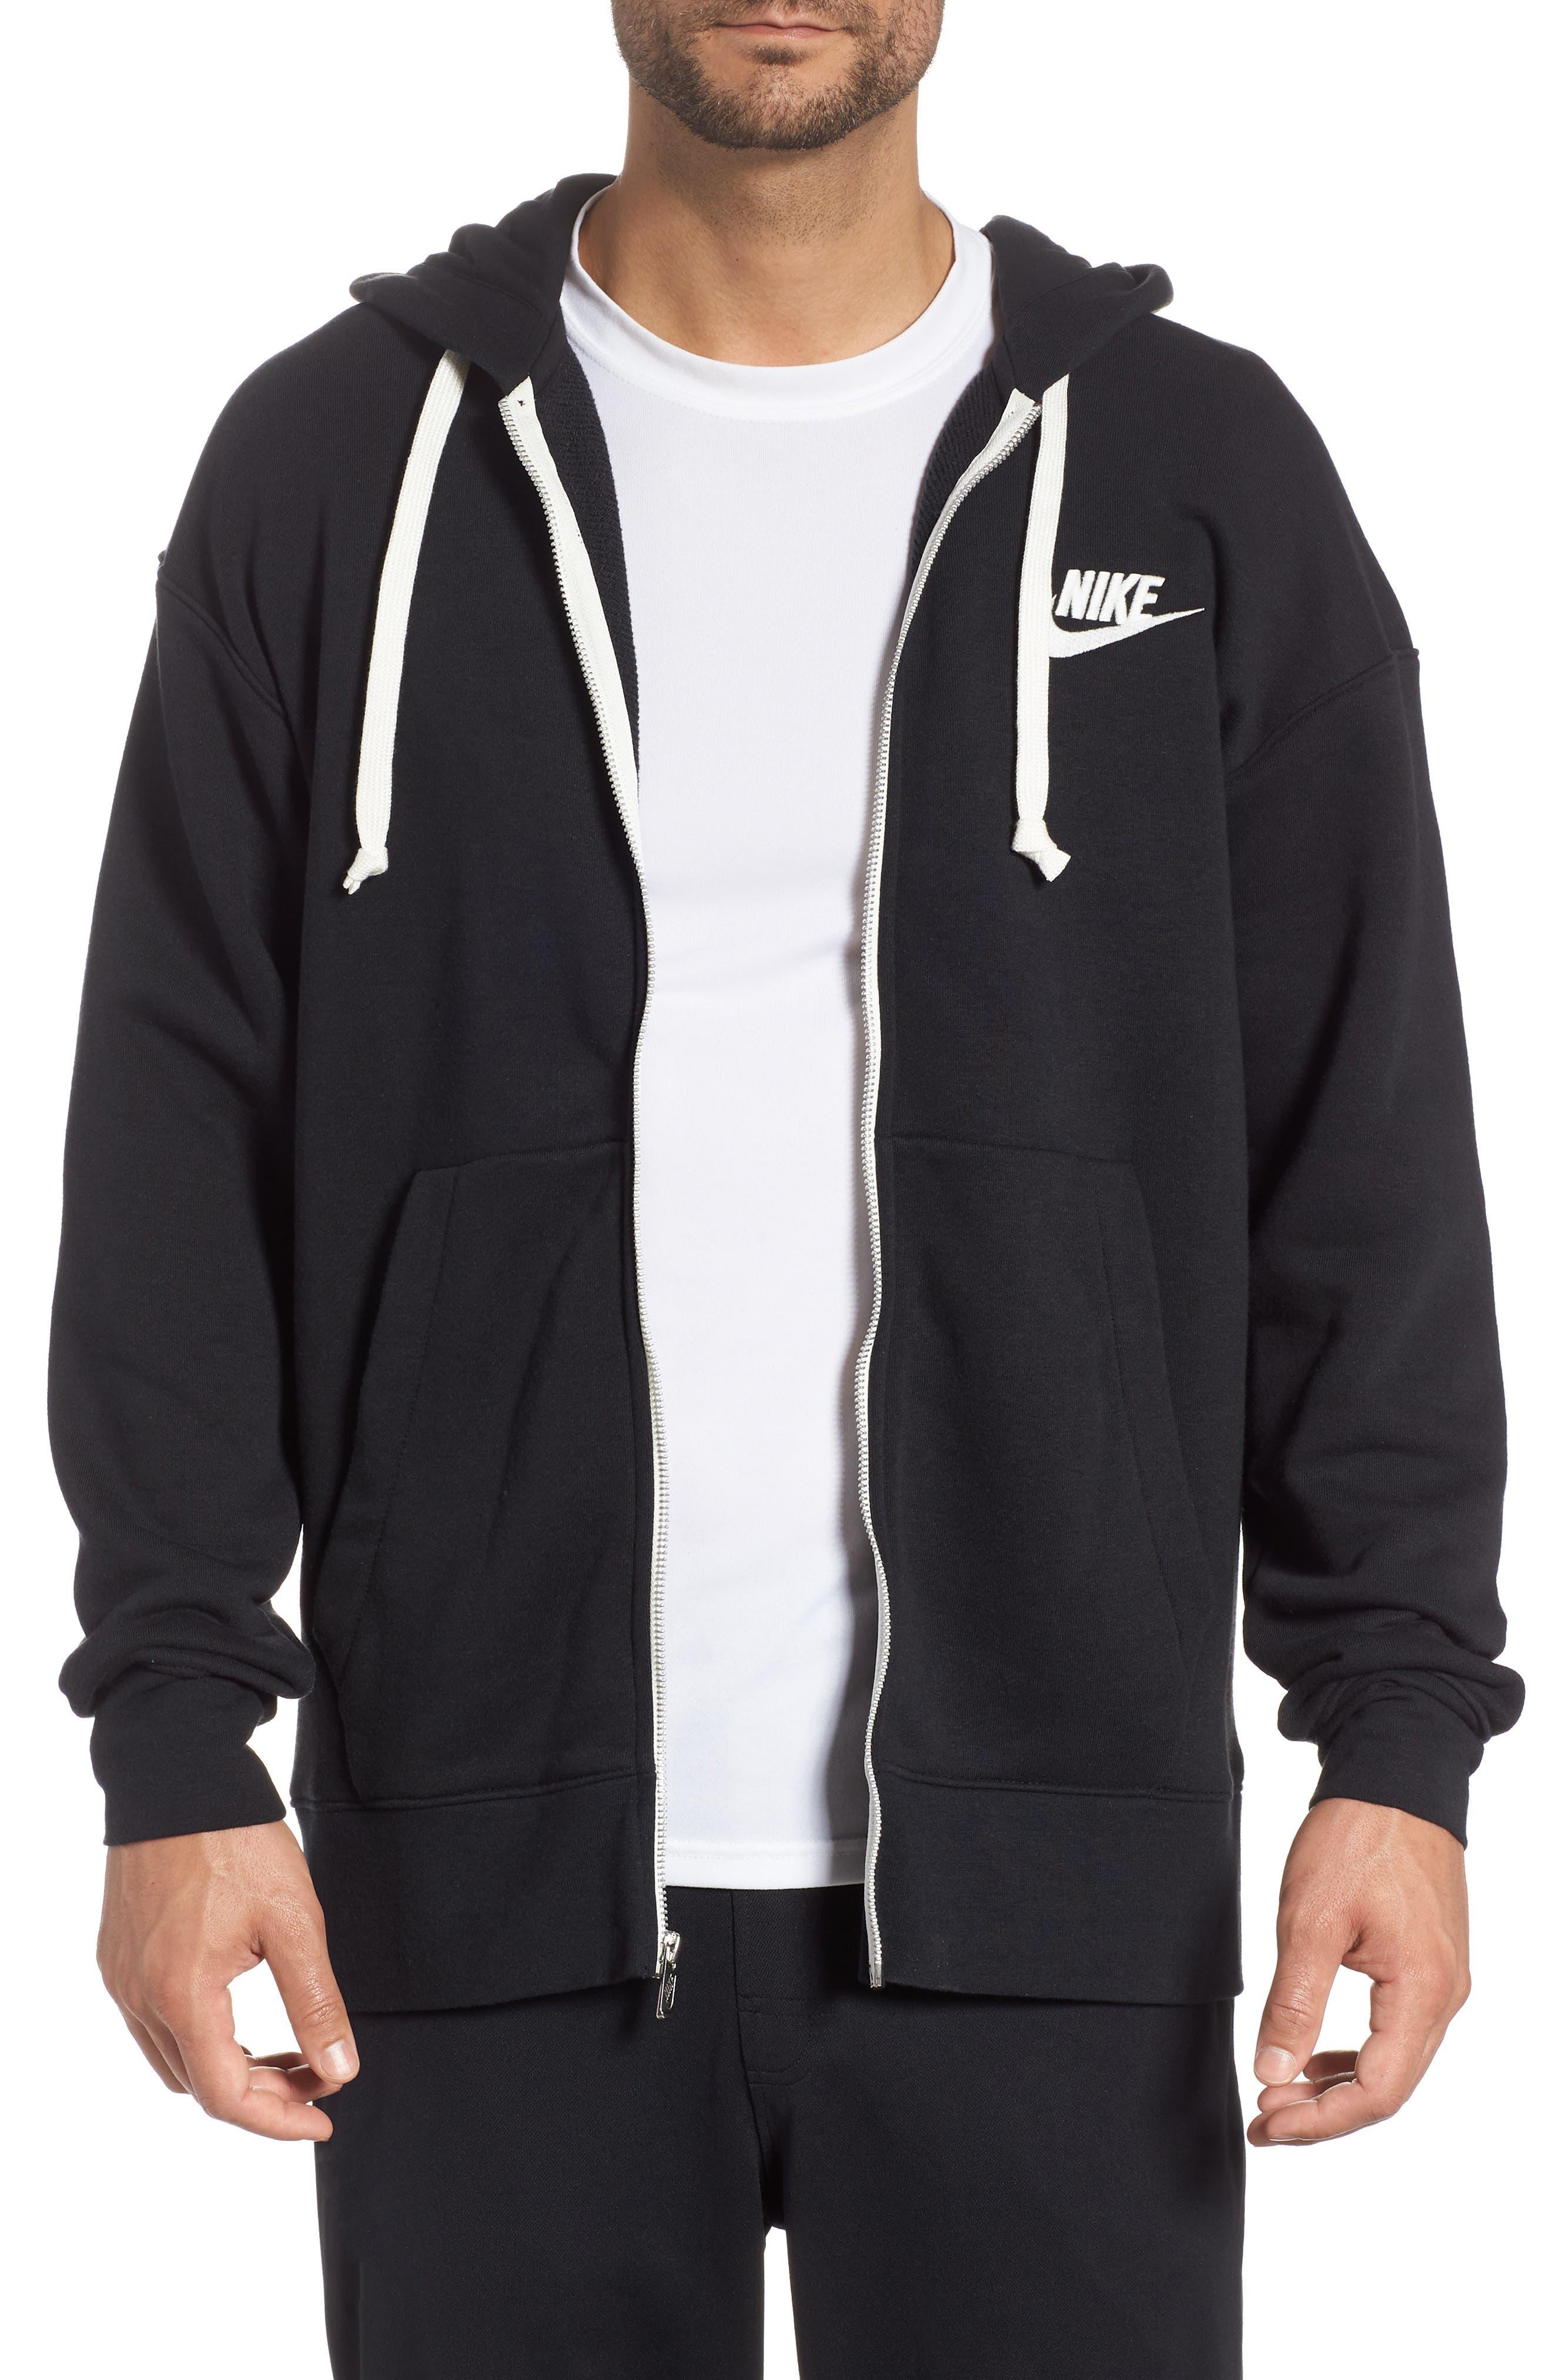 NIKE, Sportswear Heritage Zip Hoodie, Main thumbnail 1, color, BLACK/ SAIL